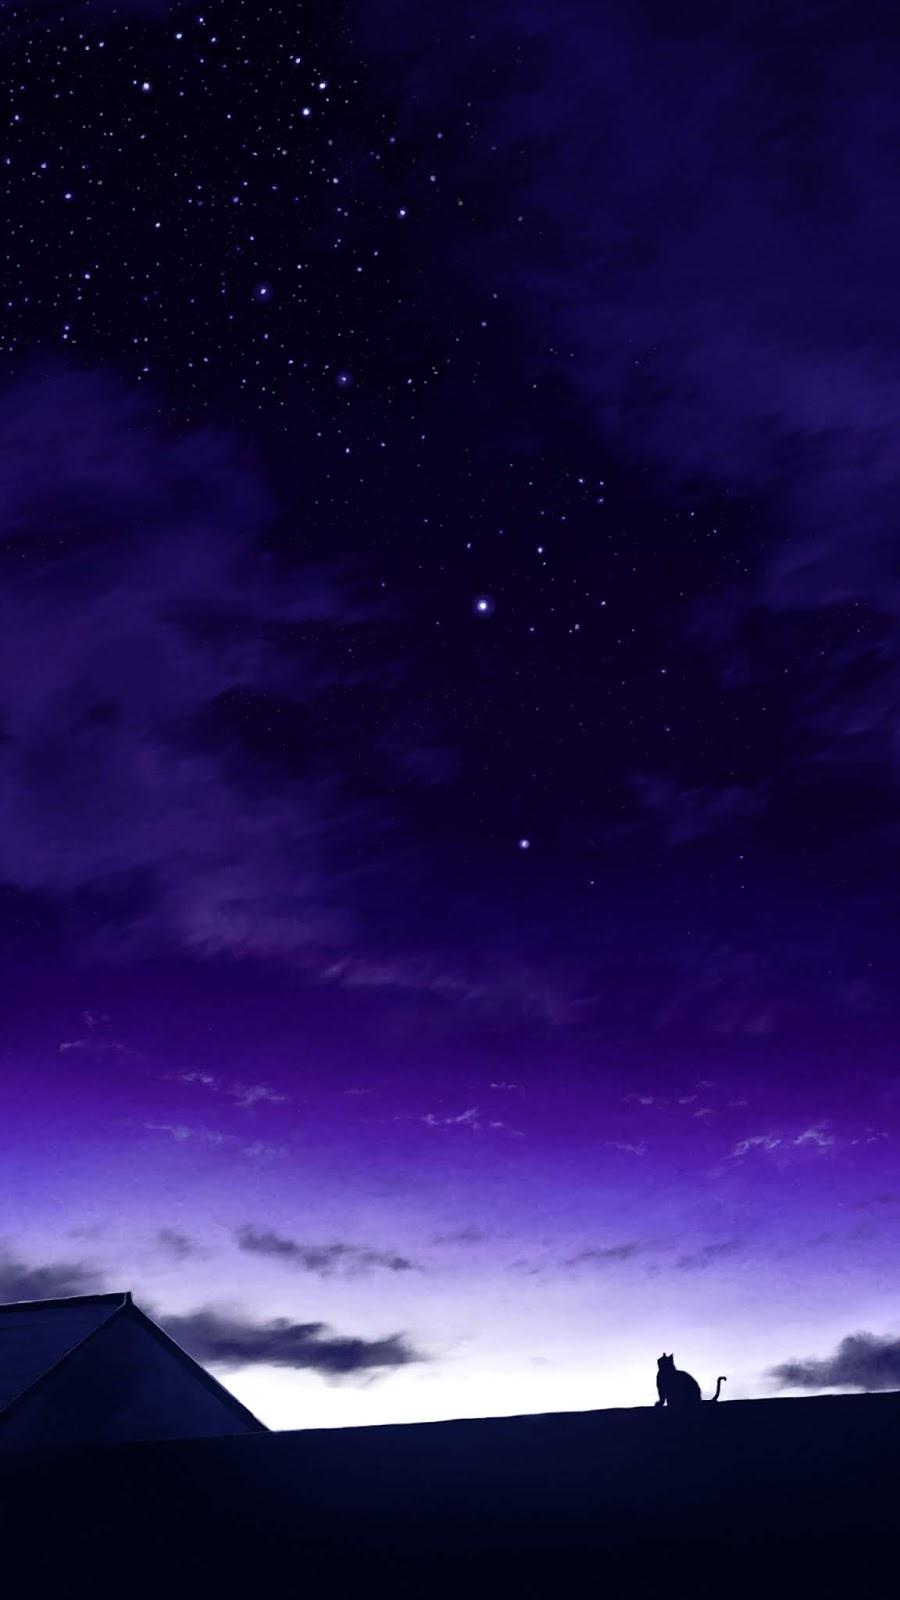 Watching the night sky